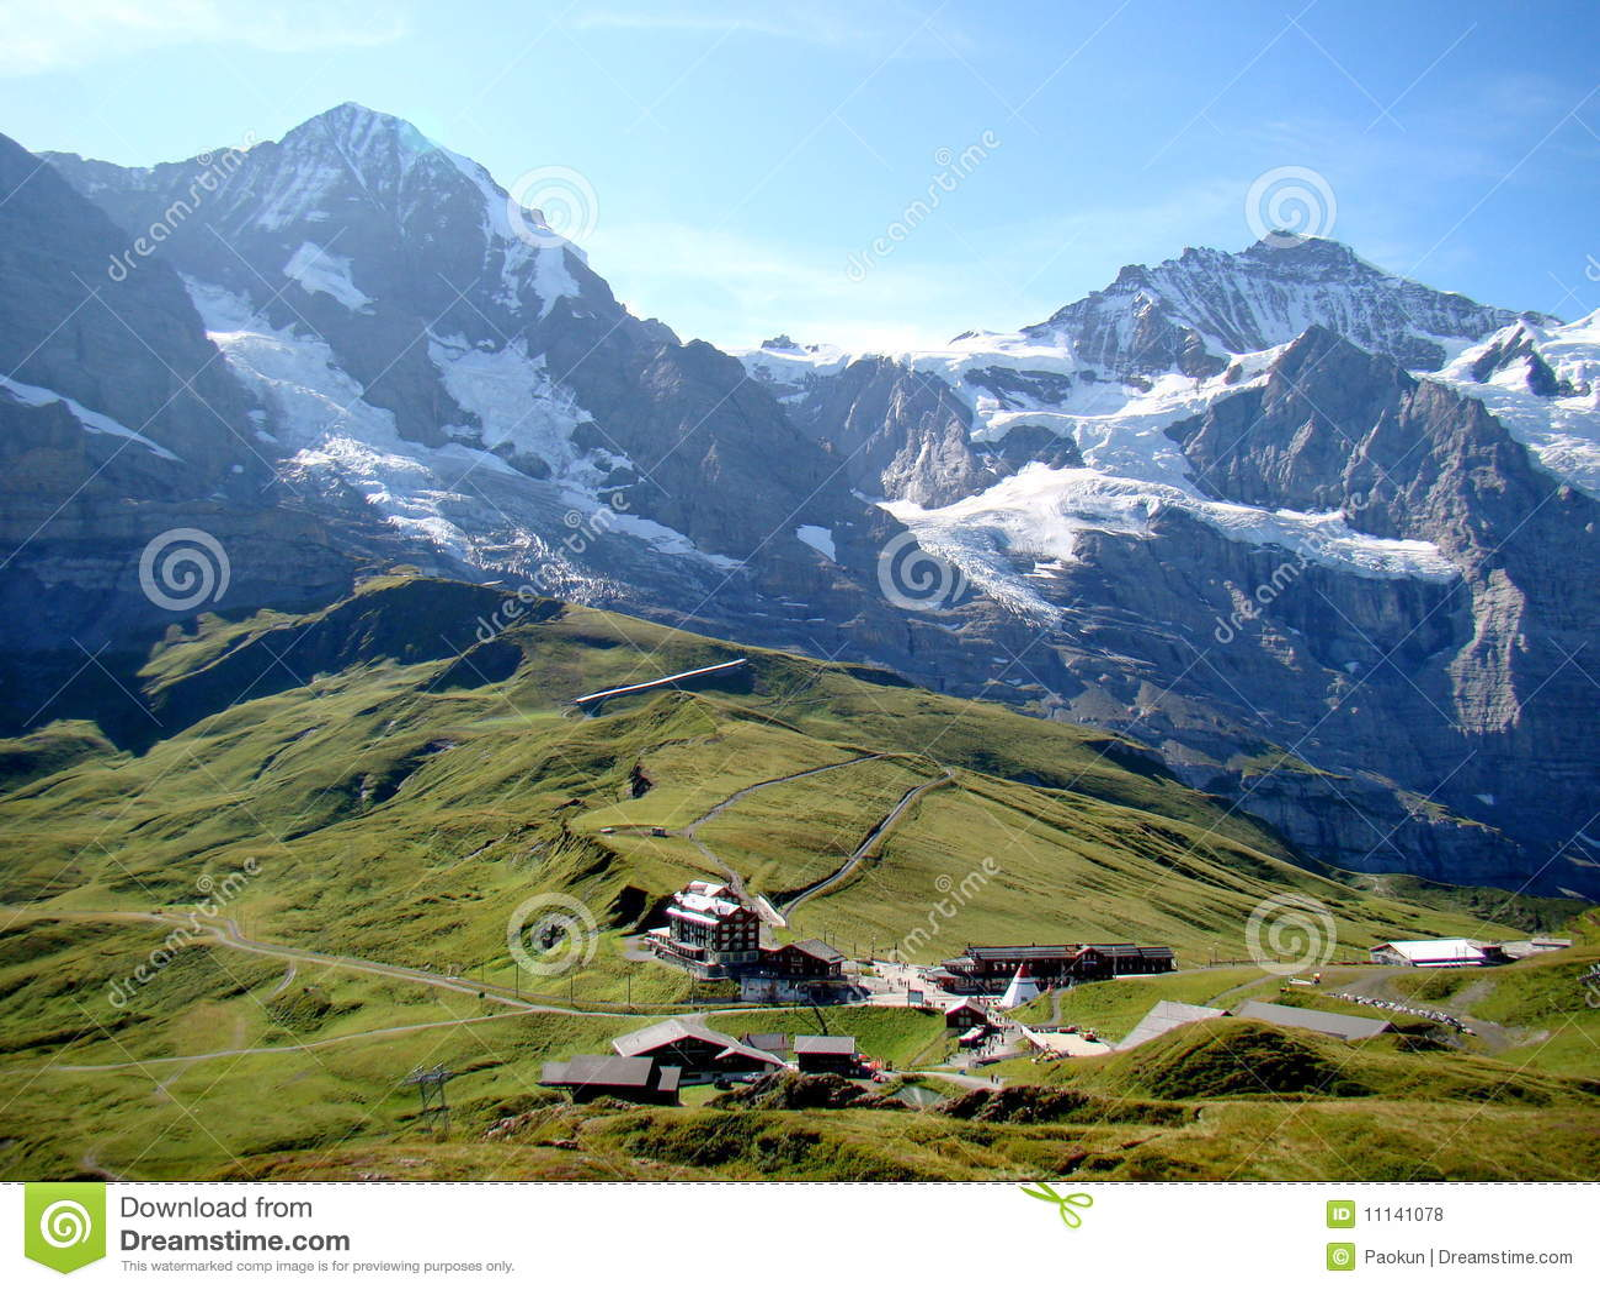 High Mountain Arts And Design